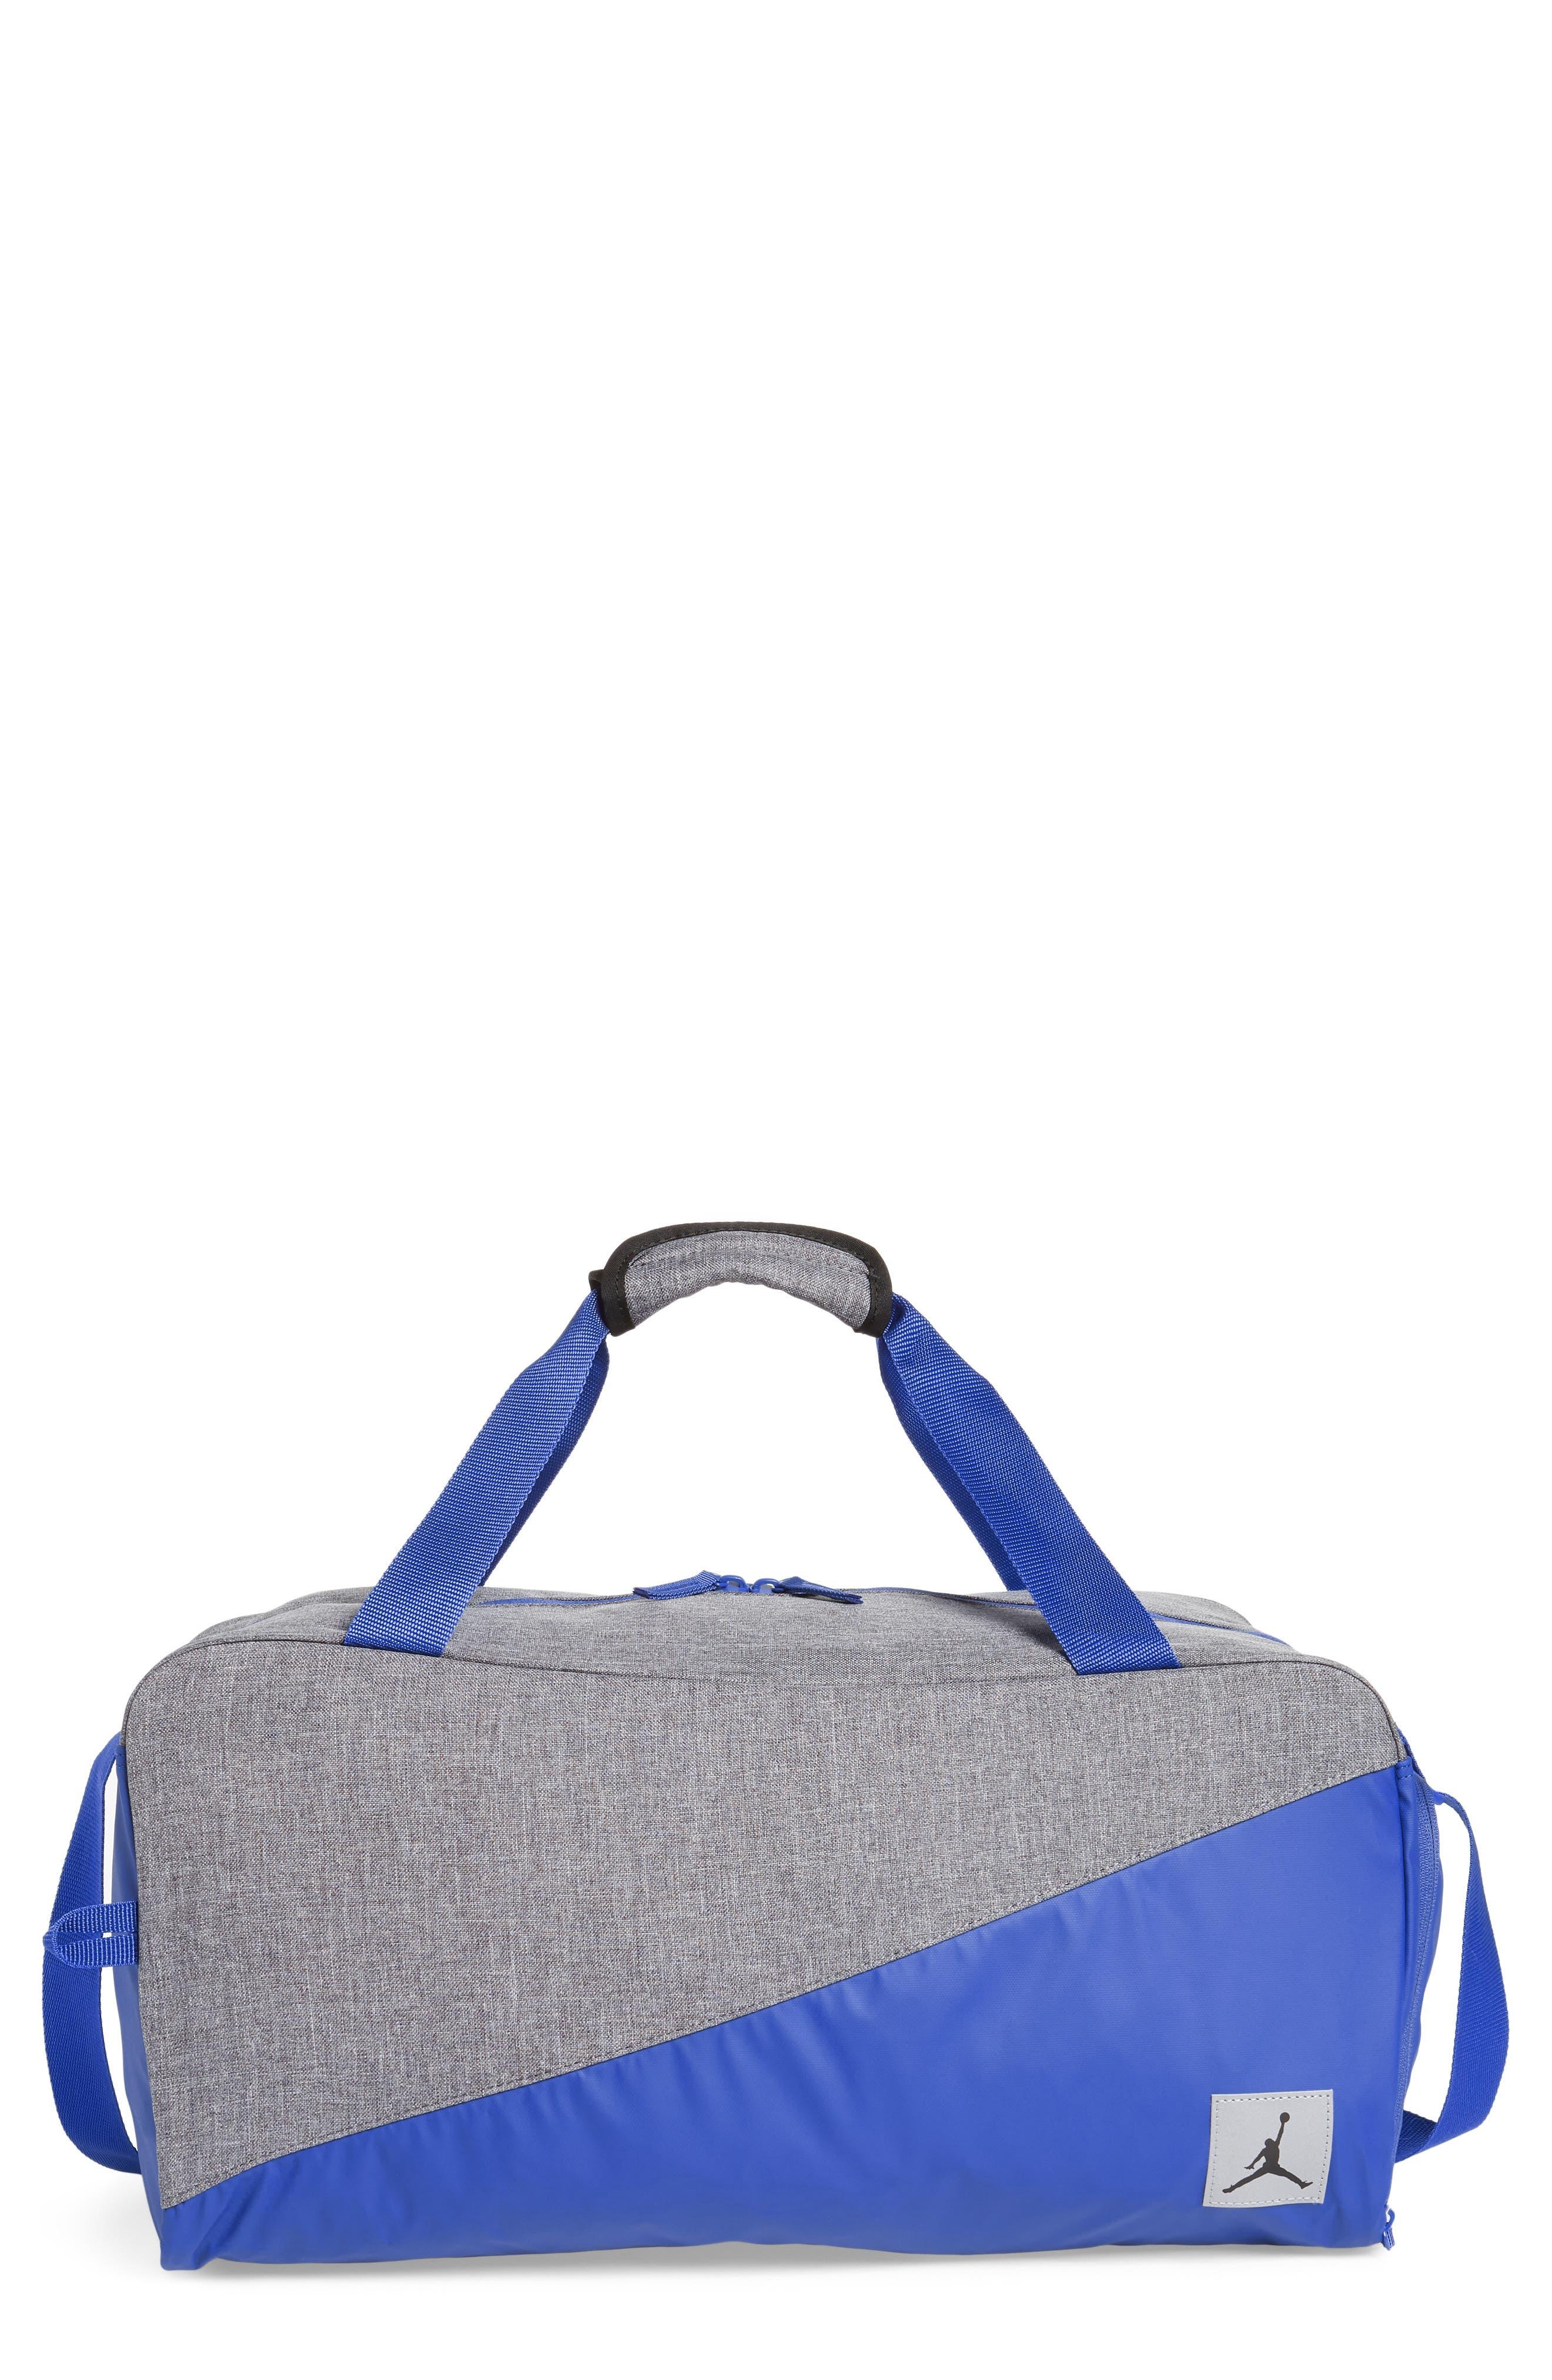 Jordan Pivot Duffle Bag,                         Main,                         color, 431